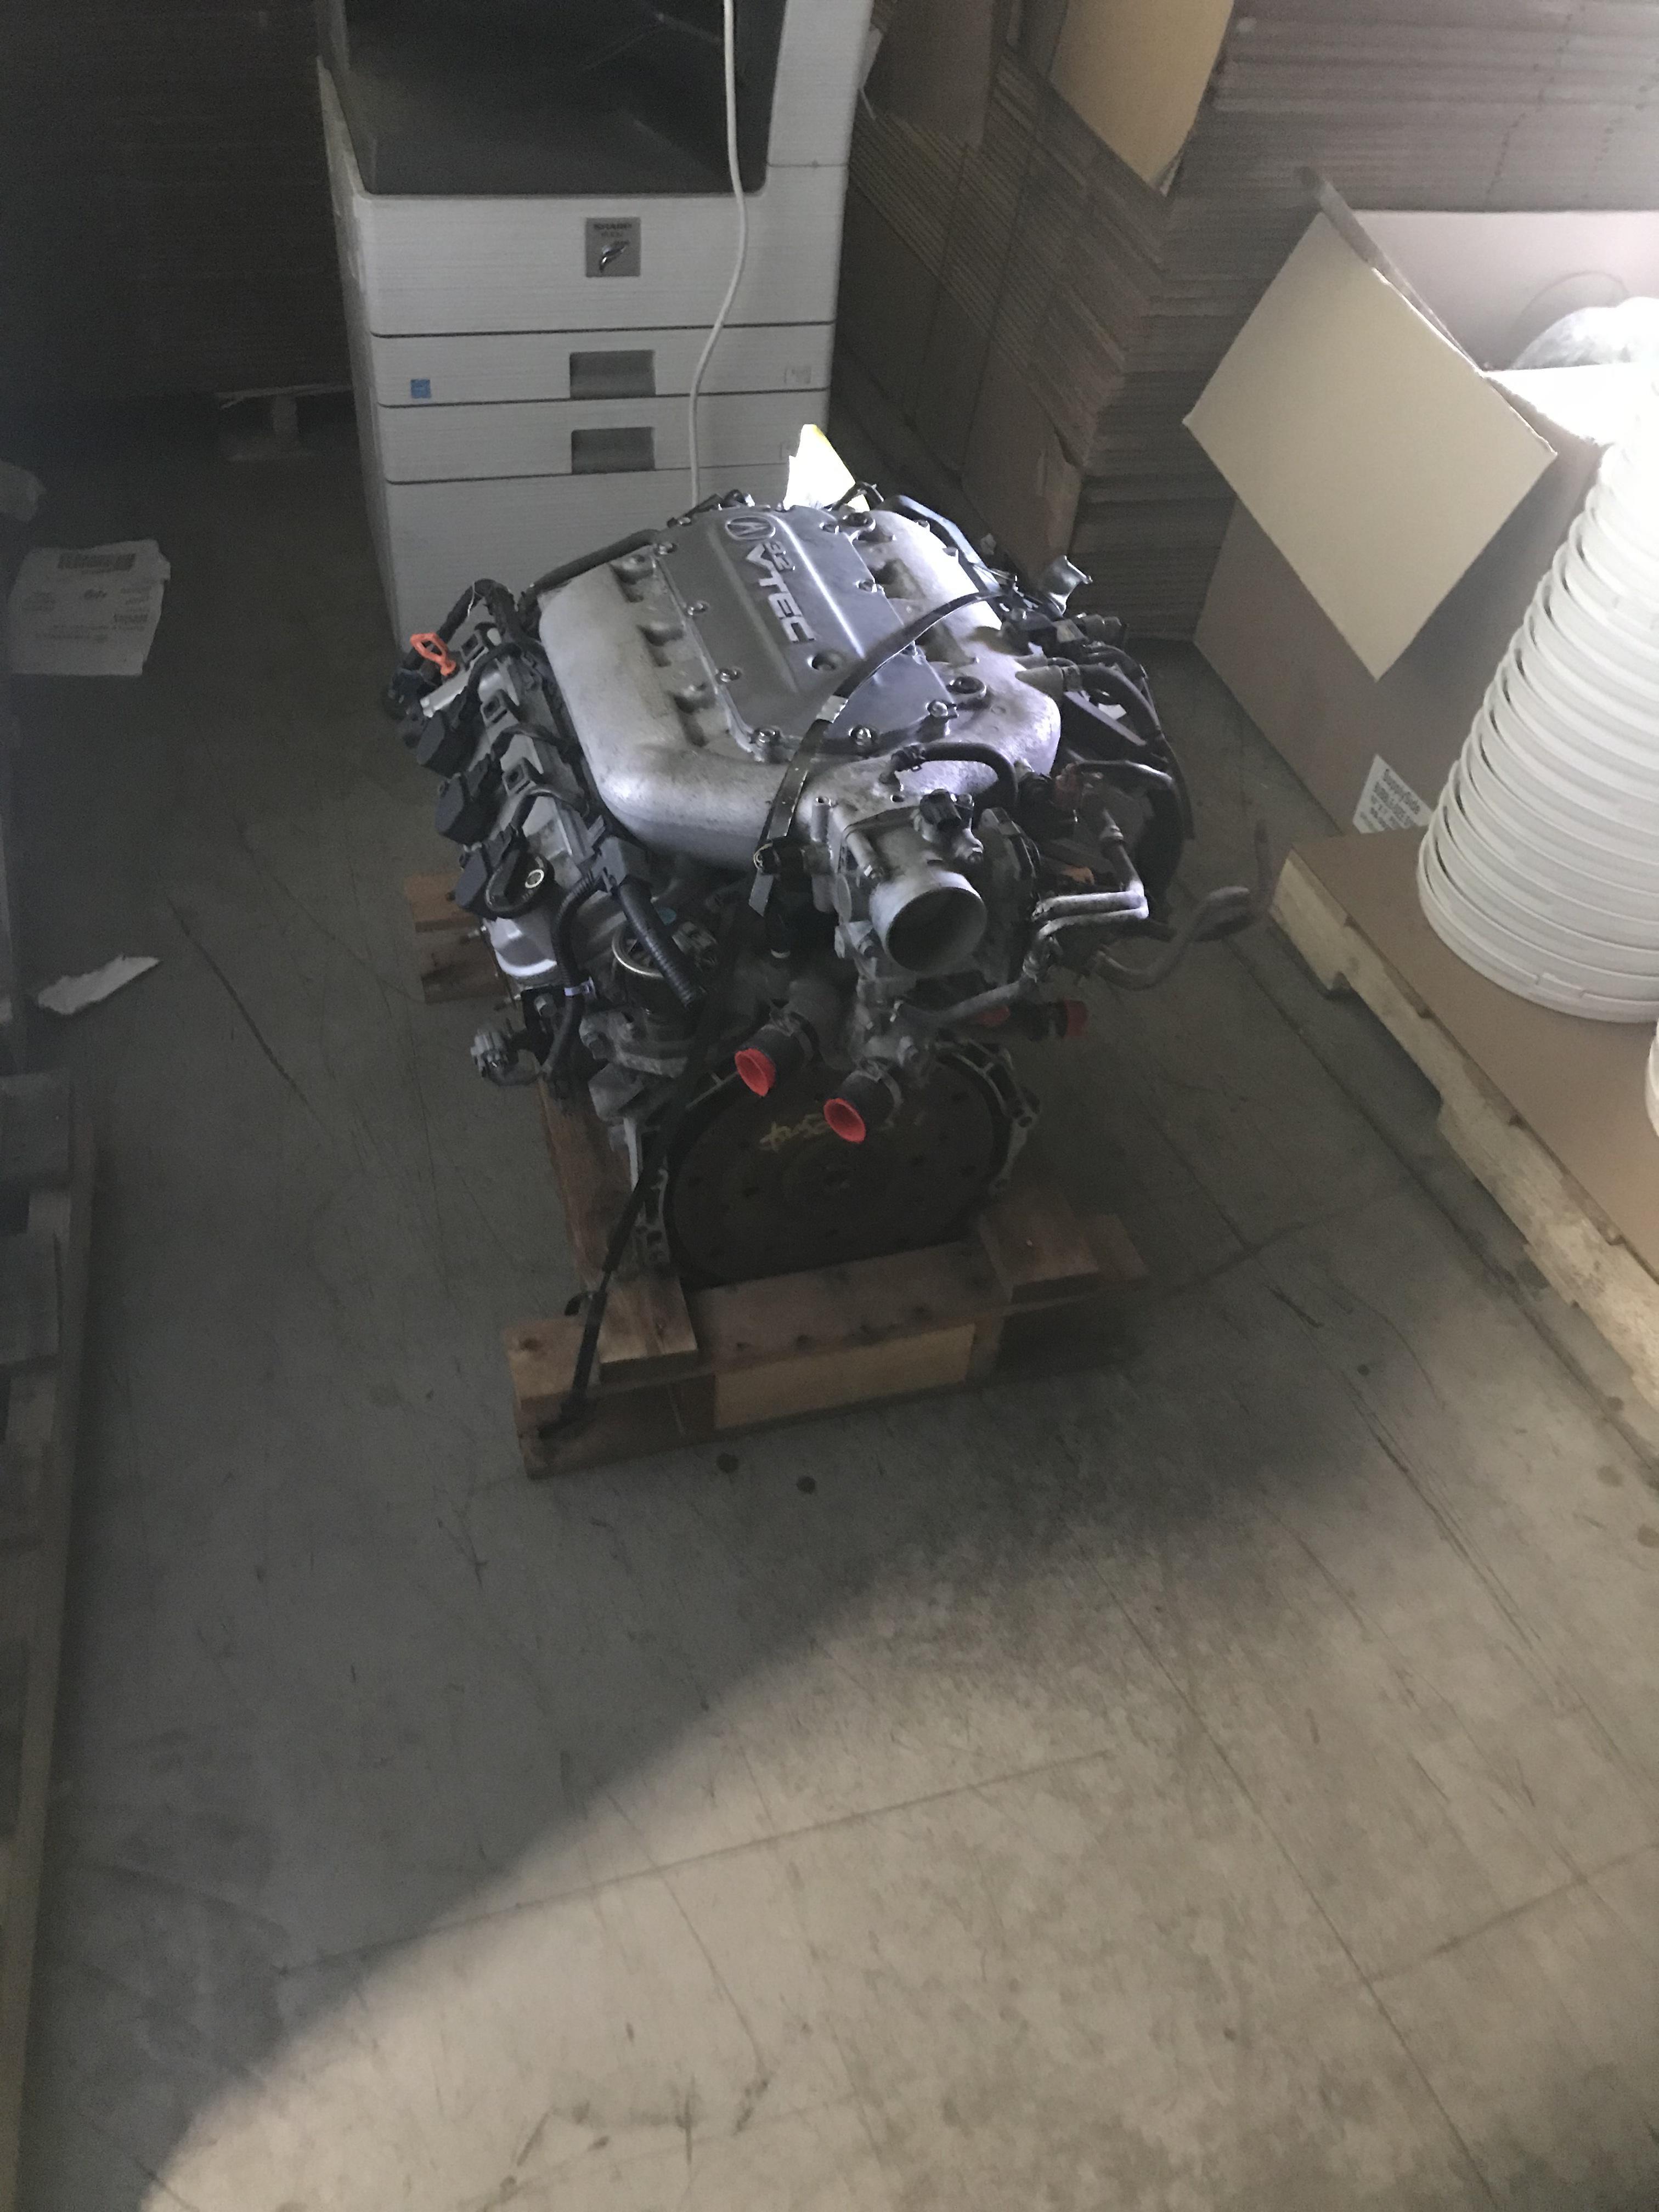 3.2 TL motor swapped success-a9c13a33-ab59-4331-bff4-bc9c9cf6cdc6_1529000125811.jpeg